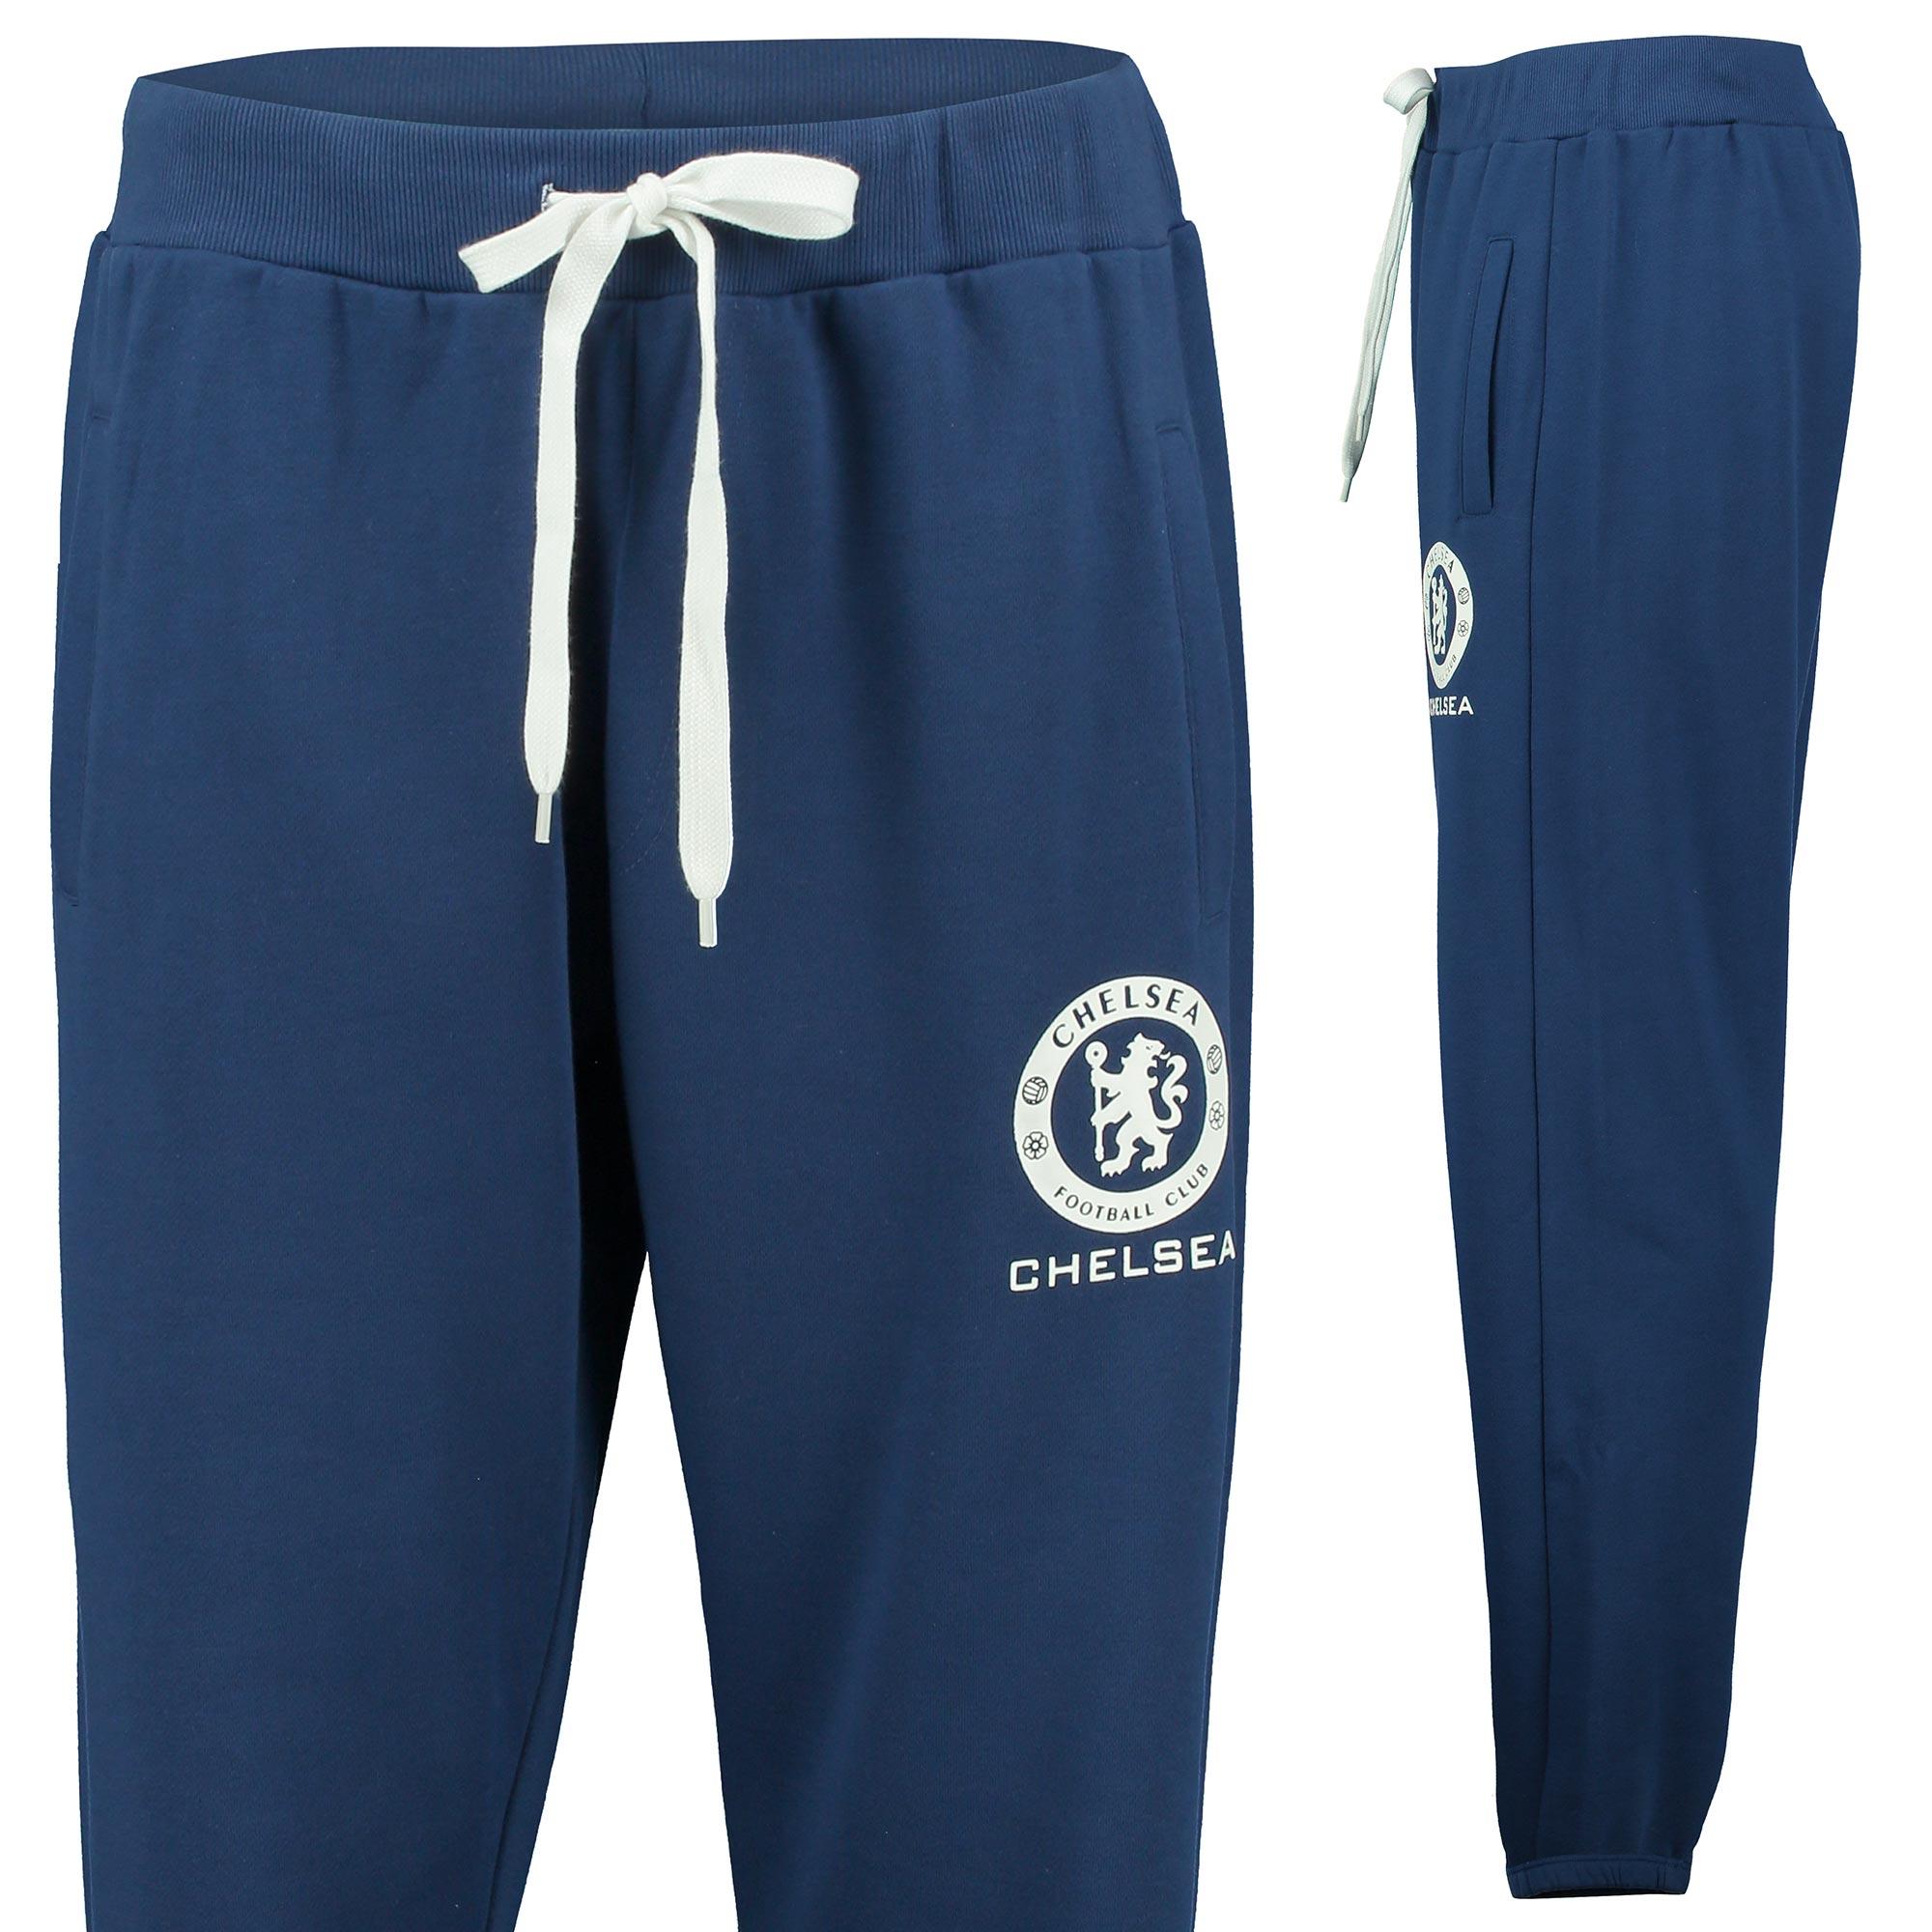 Chelsea Essential Slim Fit Fleece Joggers - Estate Blue - Mens